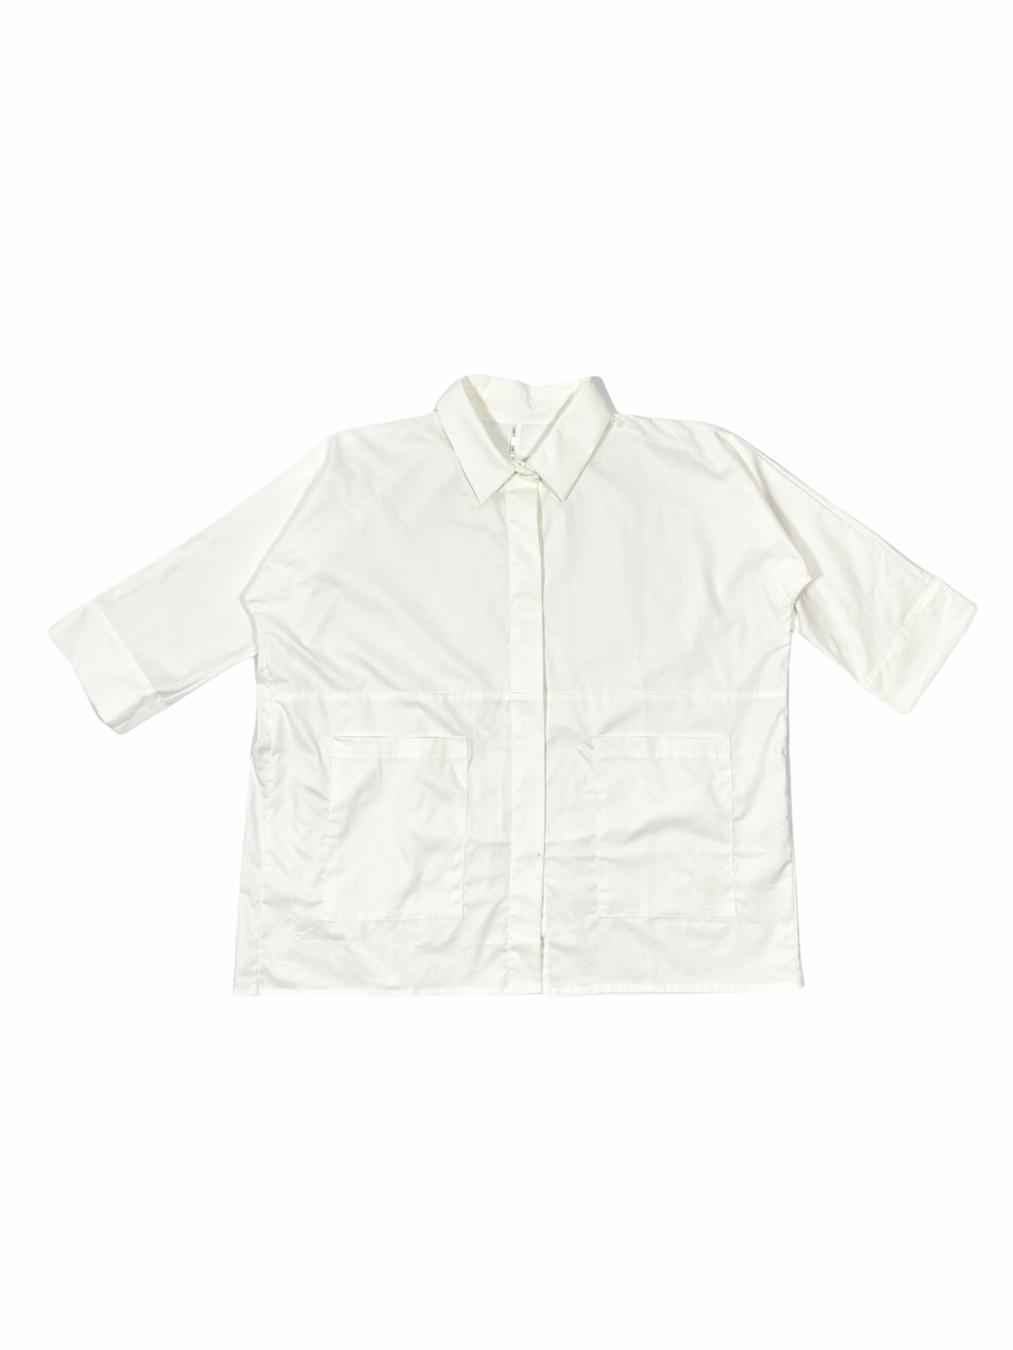 Classic Over Shirt (White)